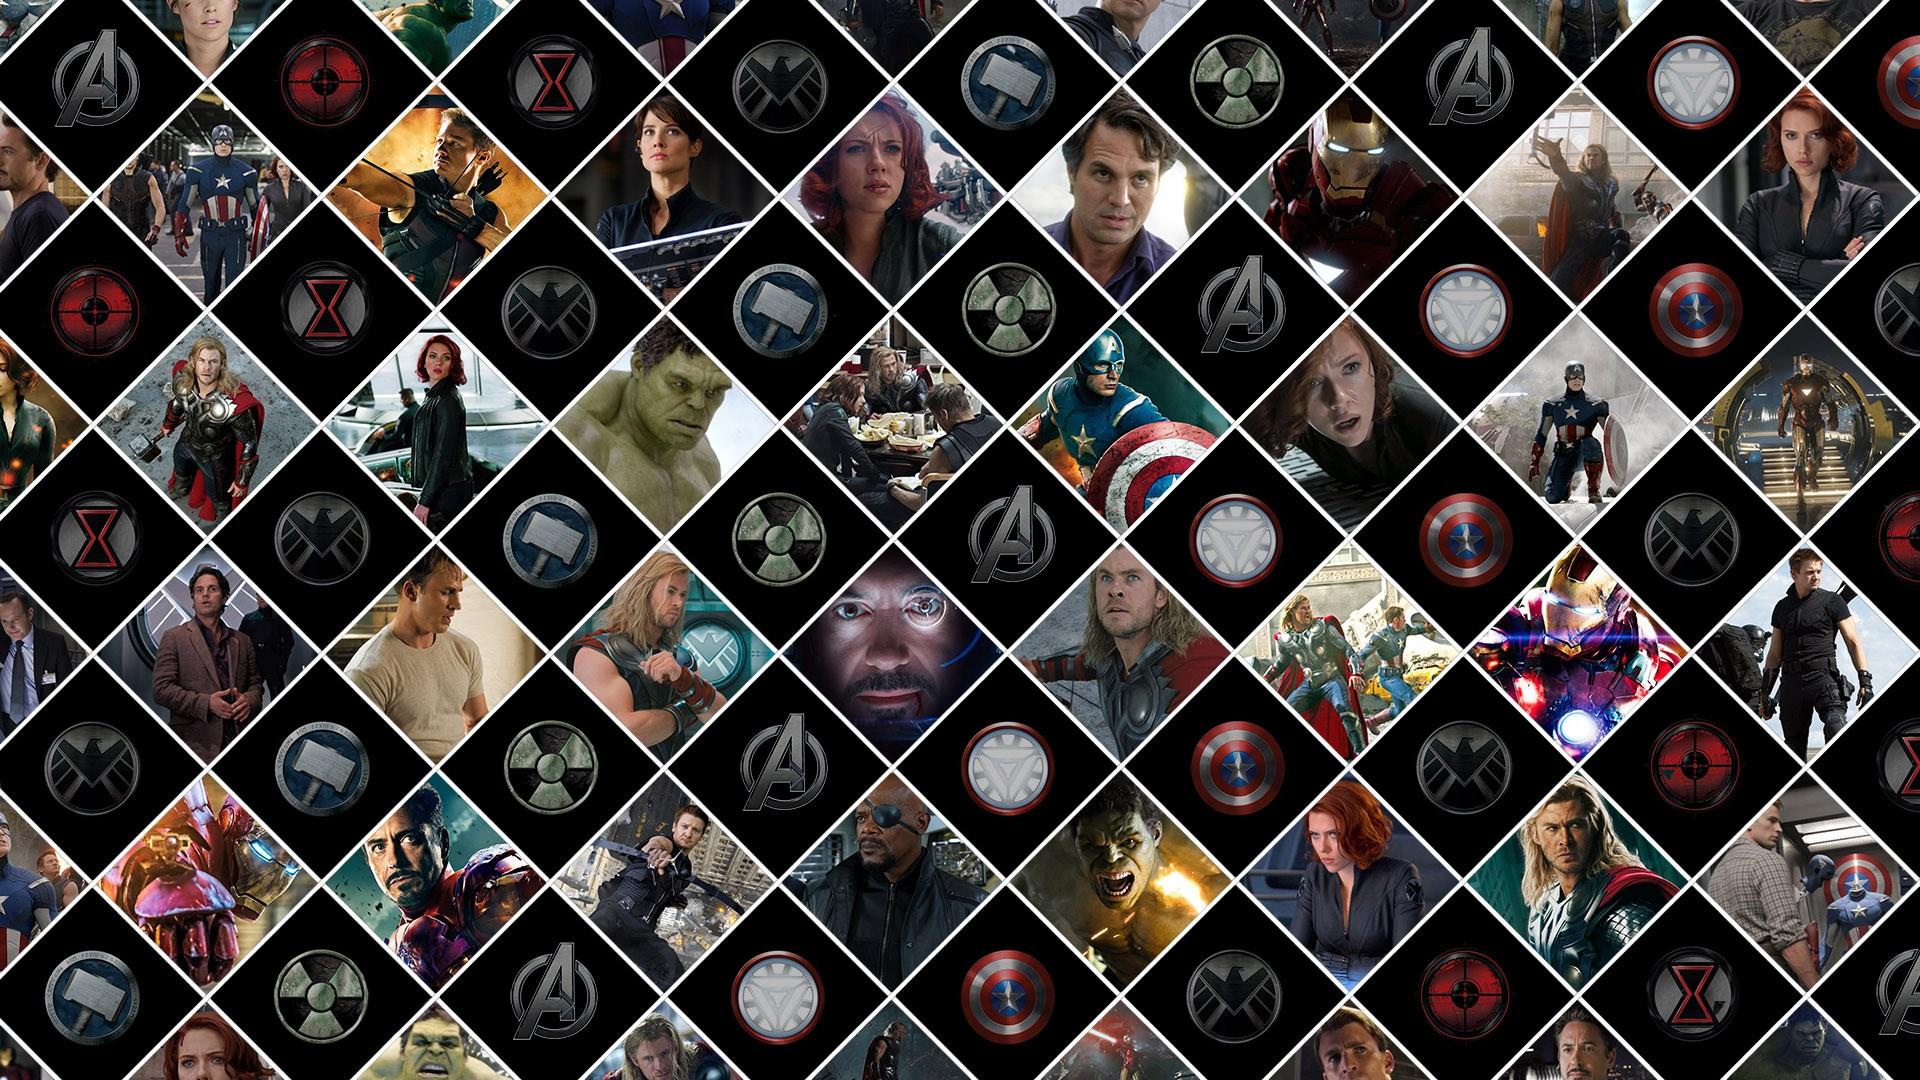 Avengers Marvel Pattern superhero comics wallpaper 1920x1080 1920x1080